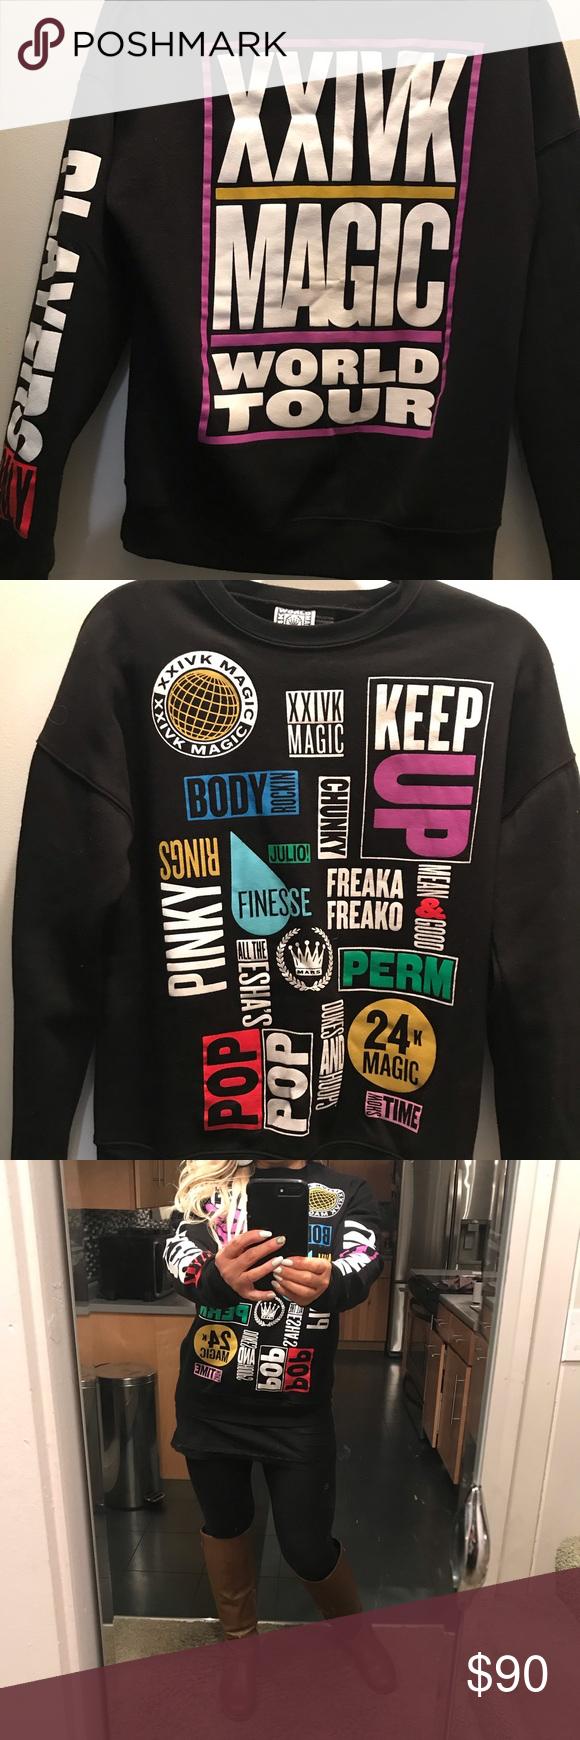 37e958f94 Bruno Mars 24K magic world tour sweatshirt sz M Beautiful, vibrant colors  Bruno Mars official merchandise sweatshirt. Sz M. Front has song titles and  lyrics ...